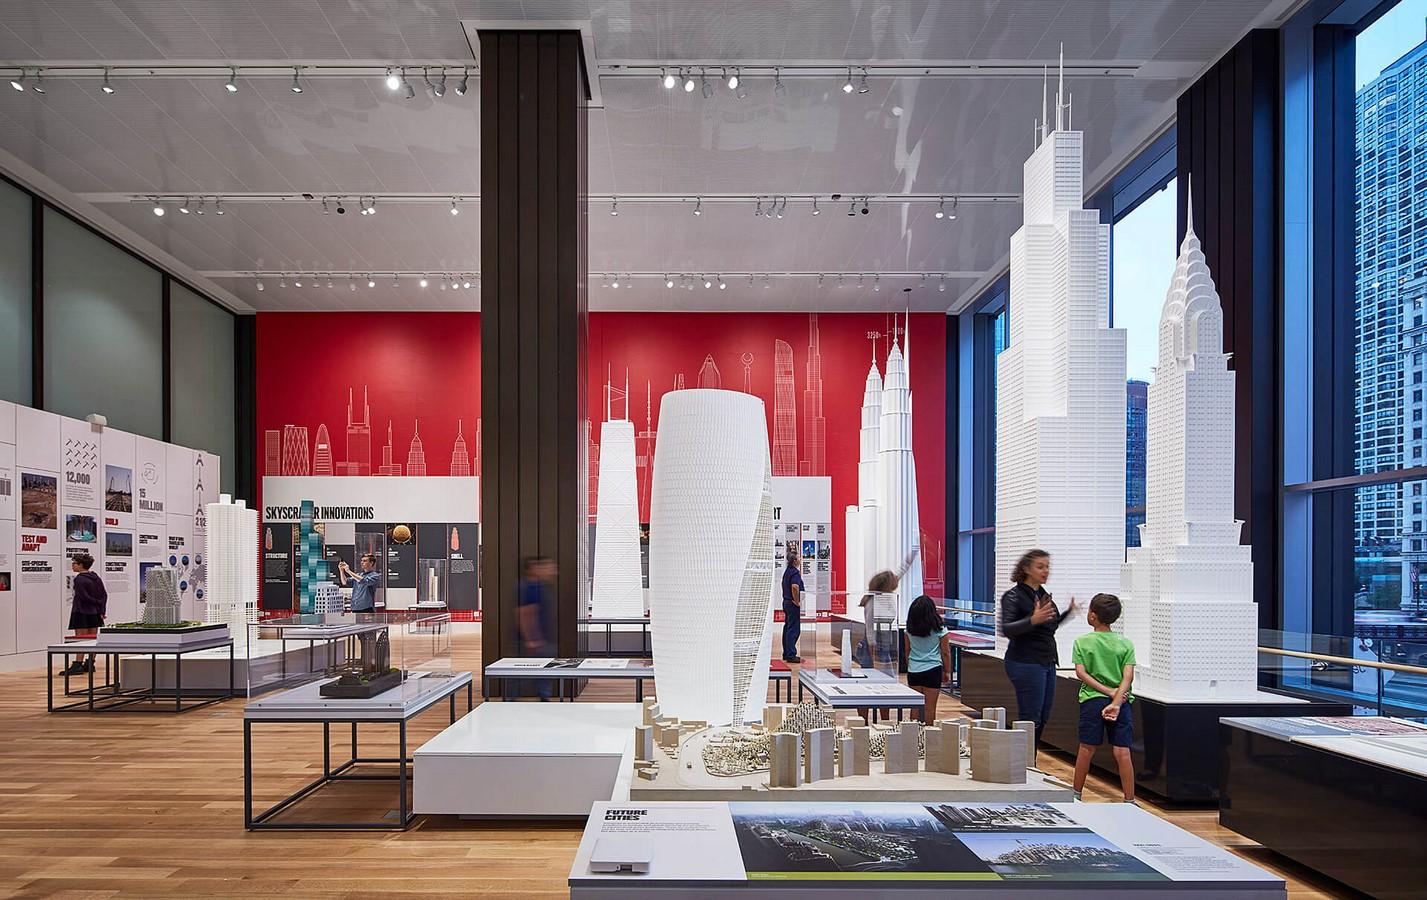 Chicago Architecture Center, Chicago, Illinois - Sheet1